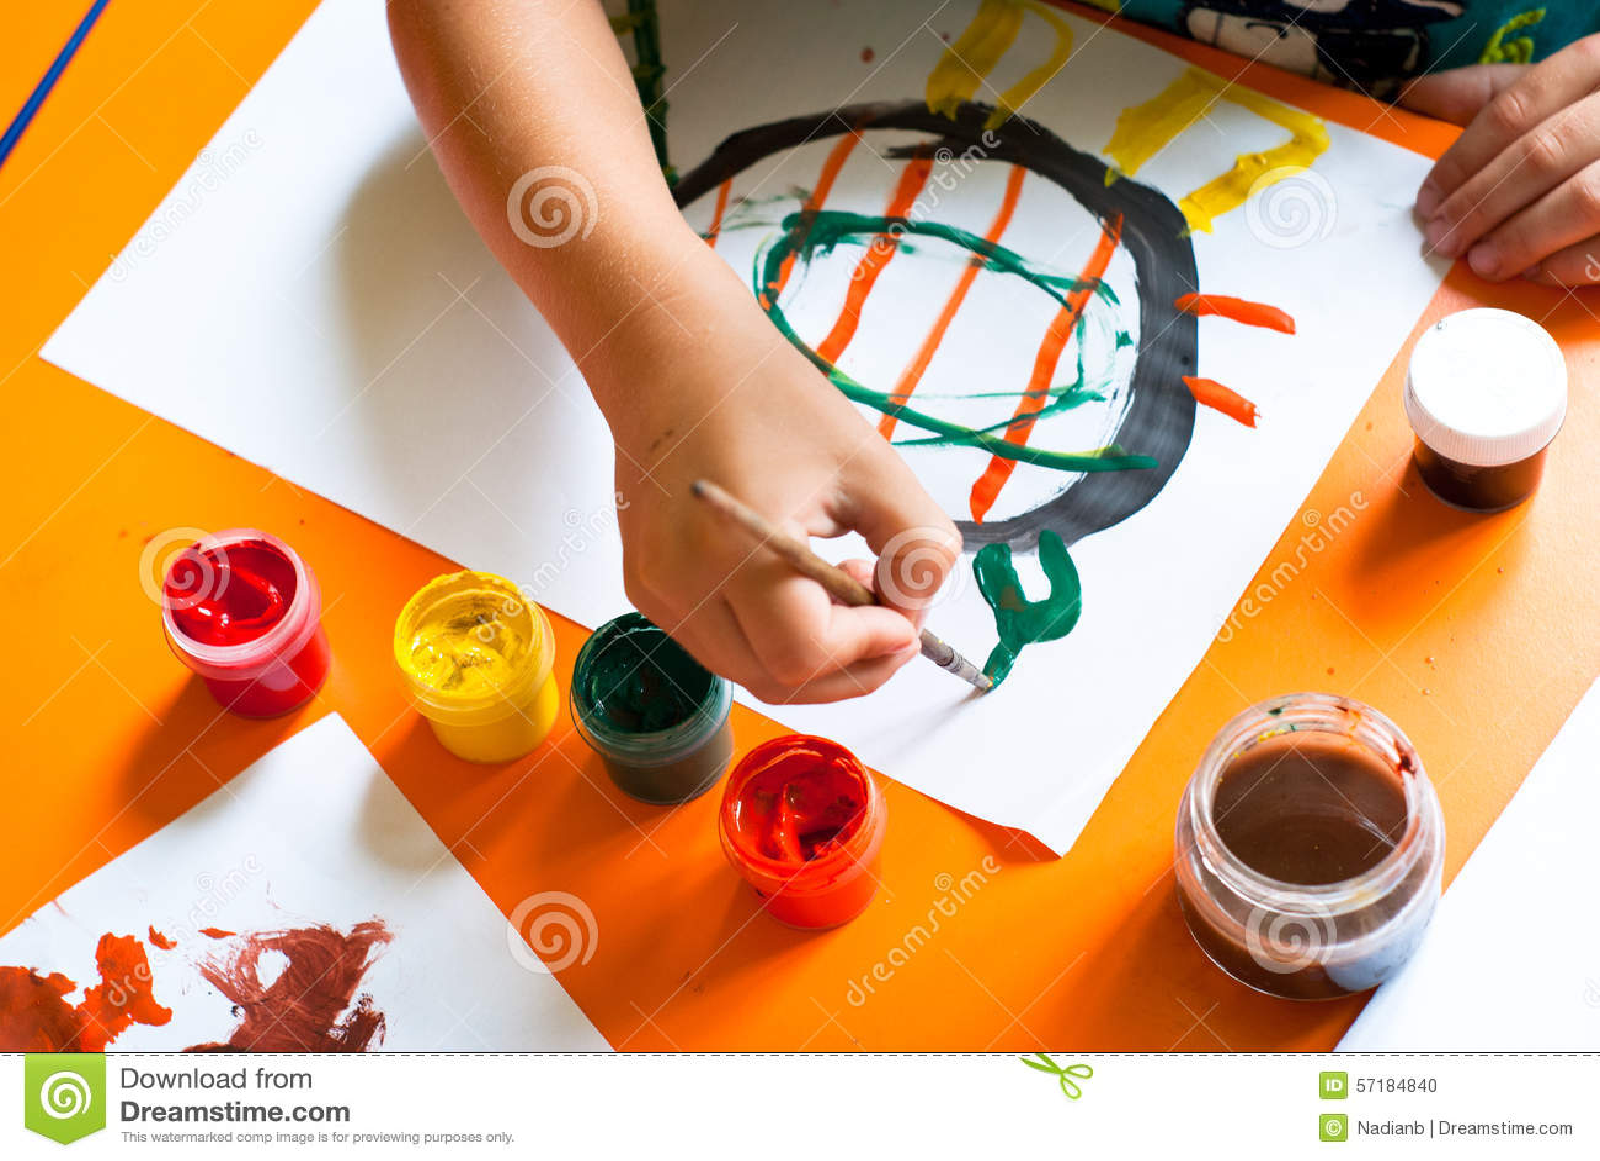 O rapaz pequeno desenha